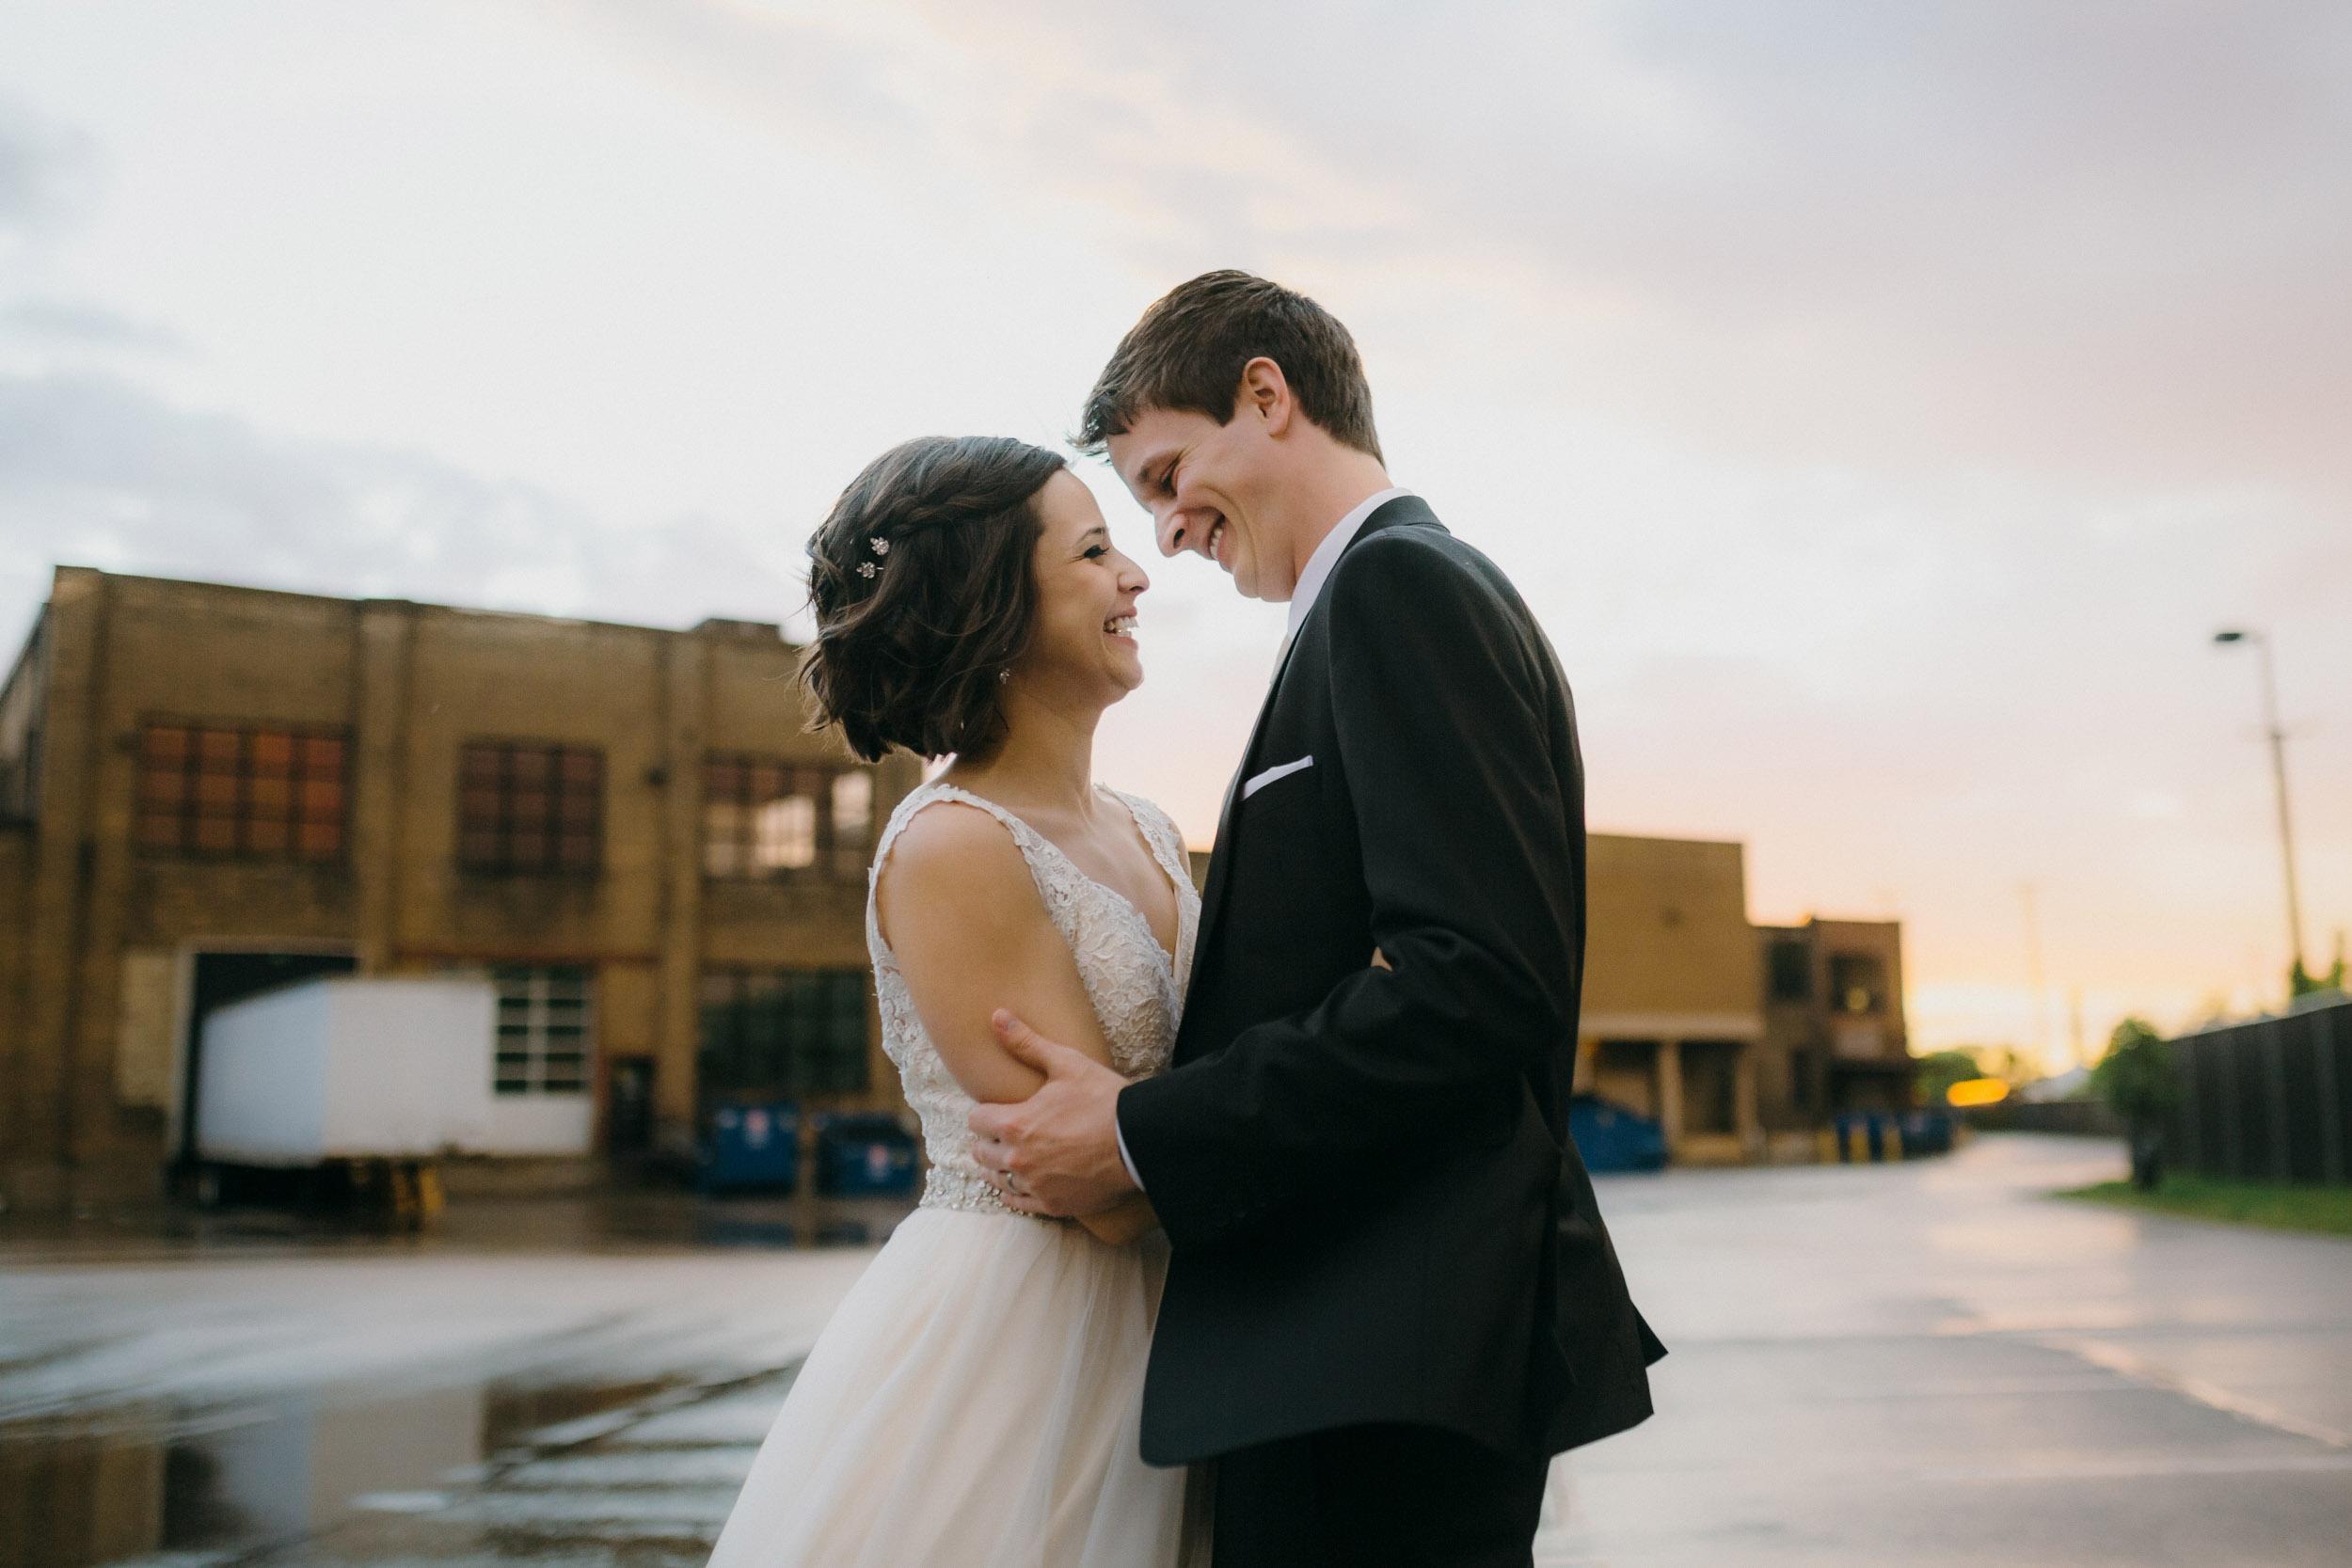 41-bauhaus minneapolis documentary wedding photographers-1.jpg